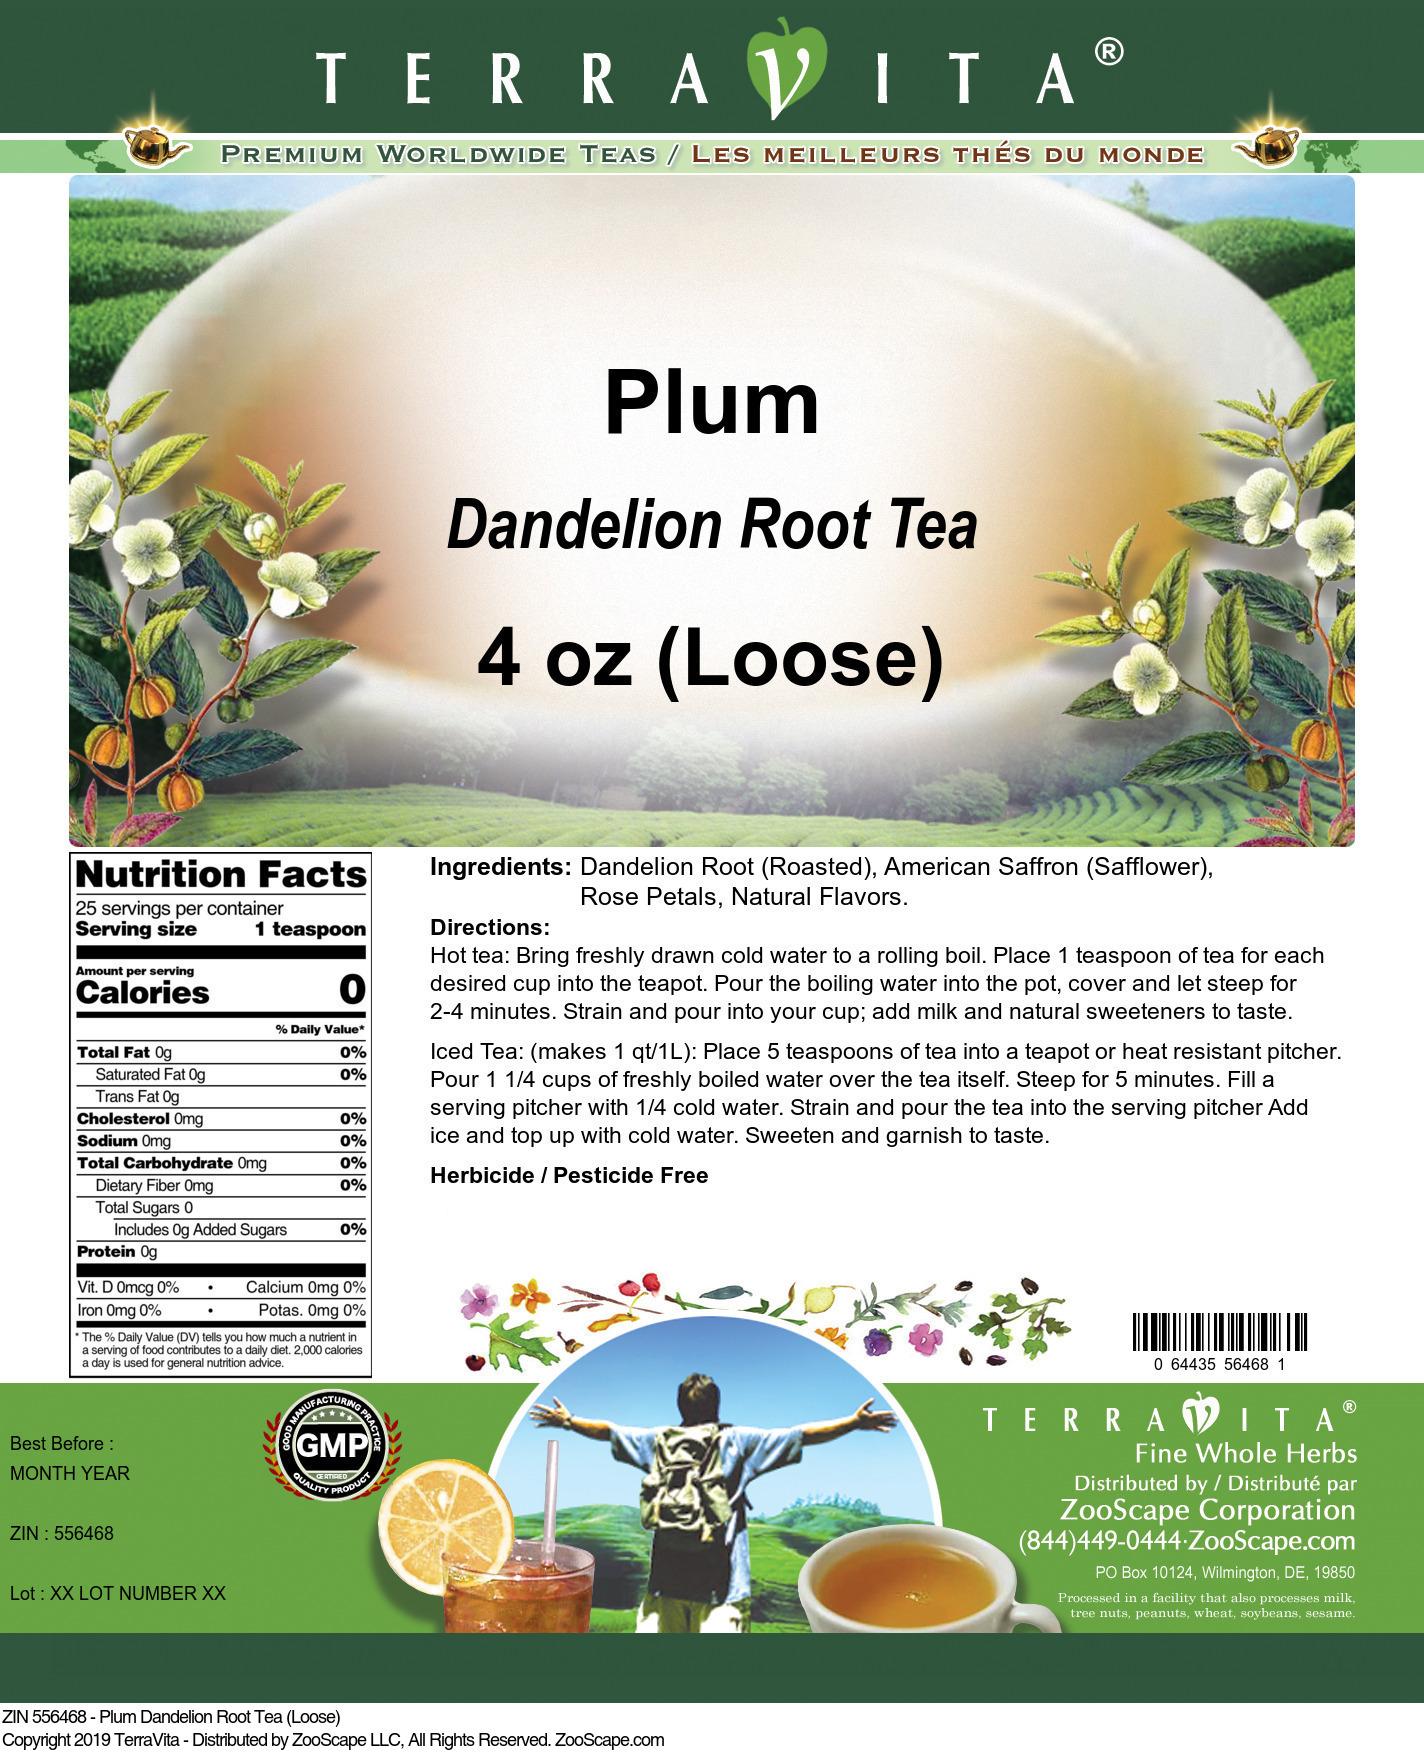 Plum Dandelion Root Tea (Loose)